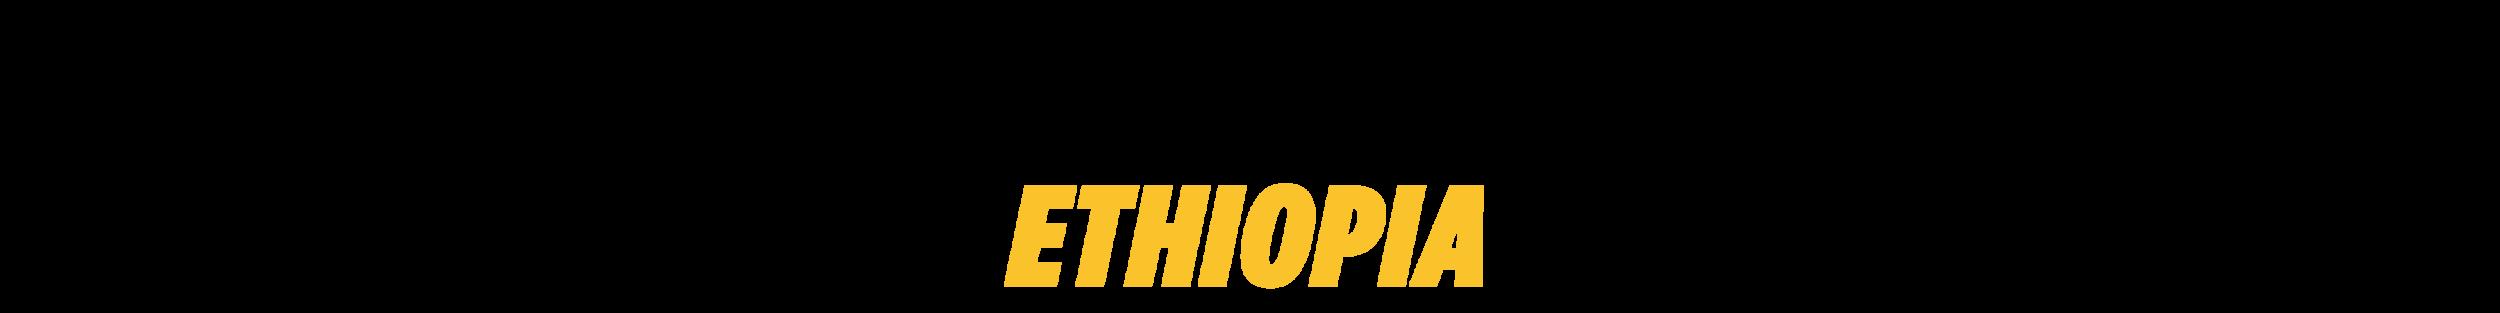 MVP_Mod-Five-Title.png